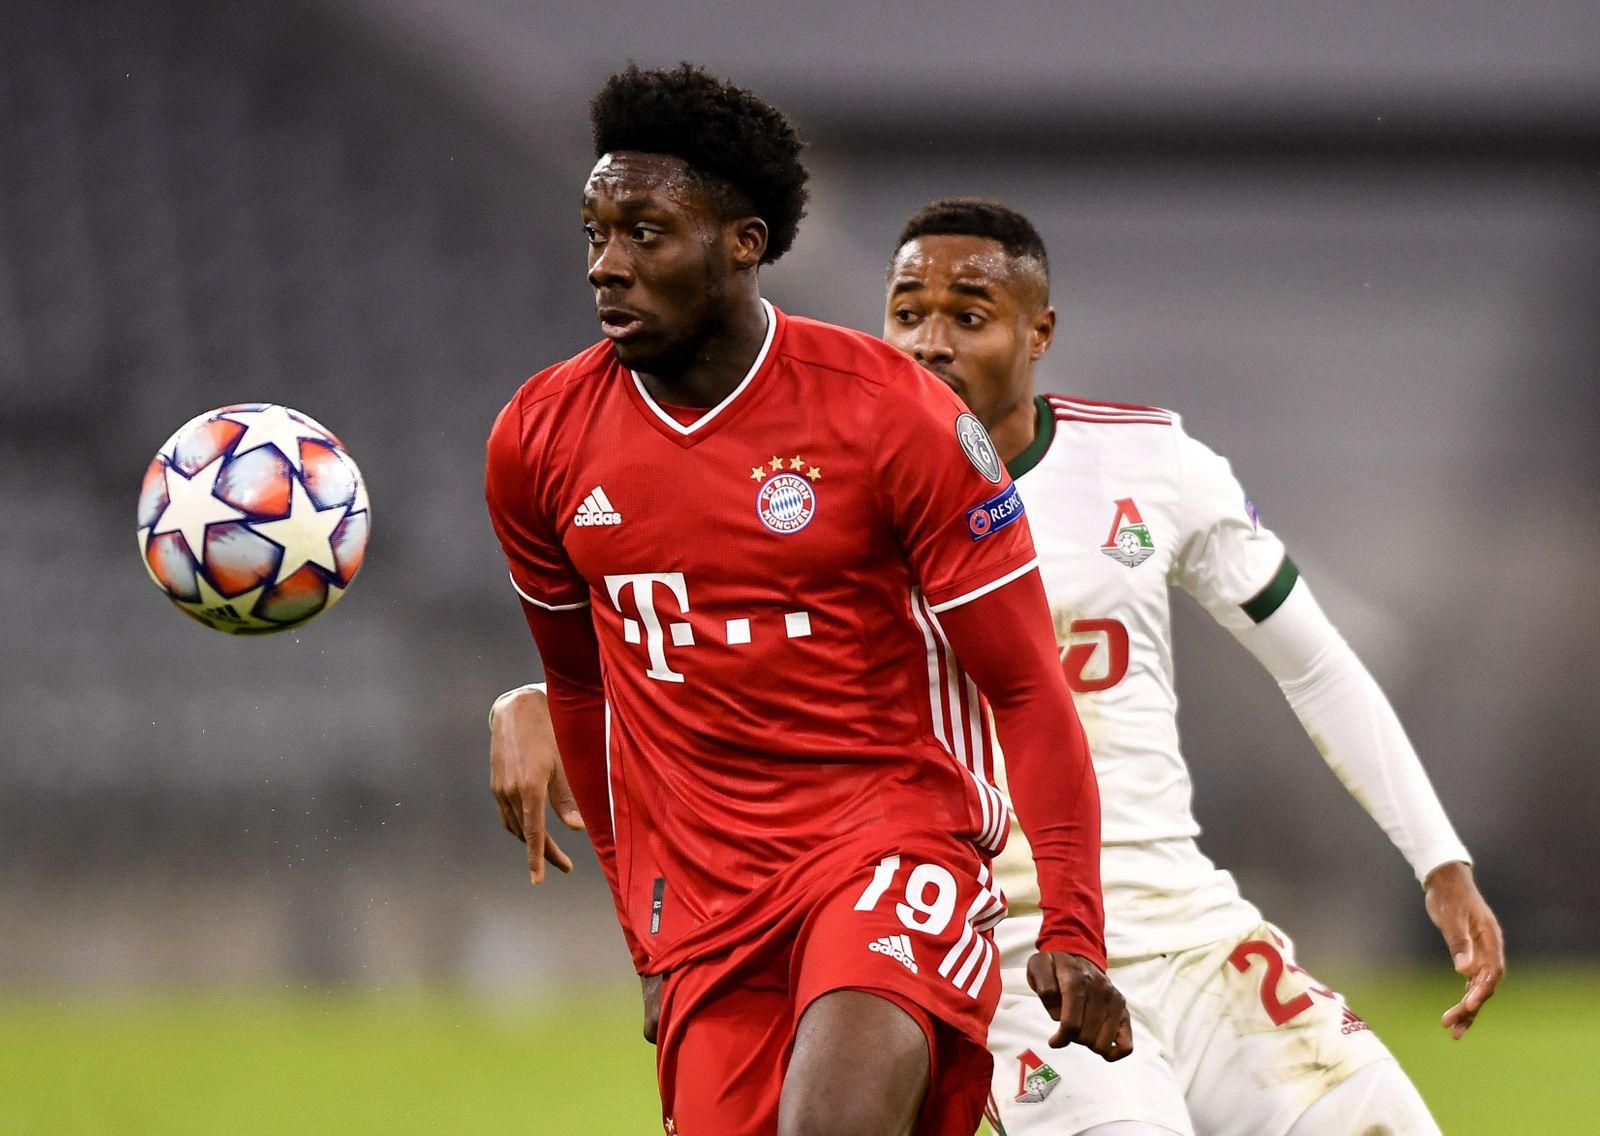 Bayern Munich vs Lokomotiv Moscow, Germany - 09 Dec 2020